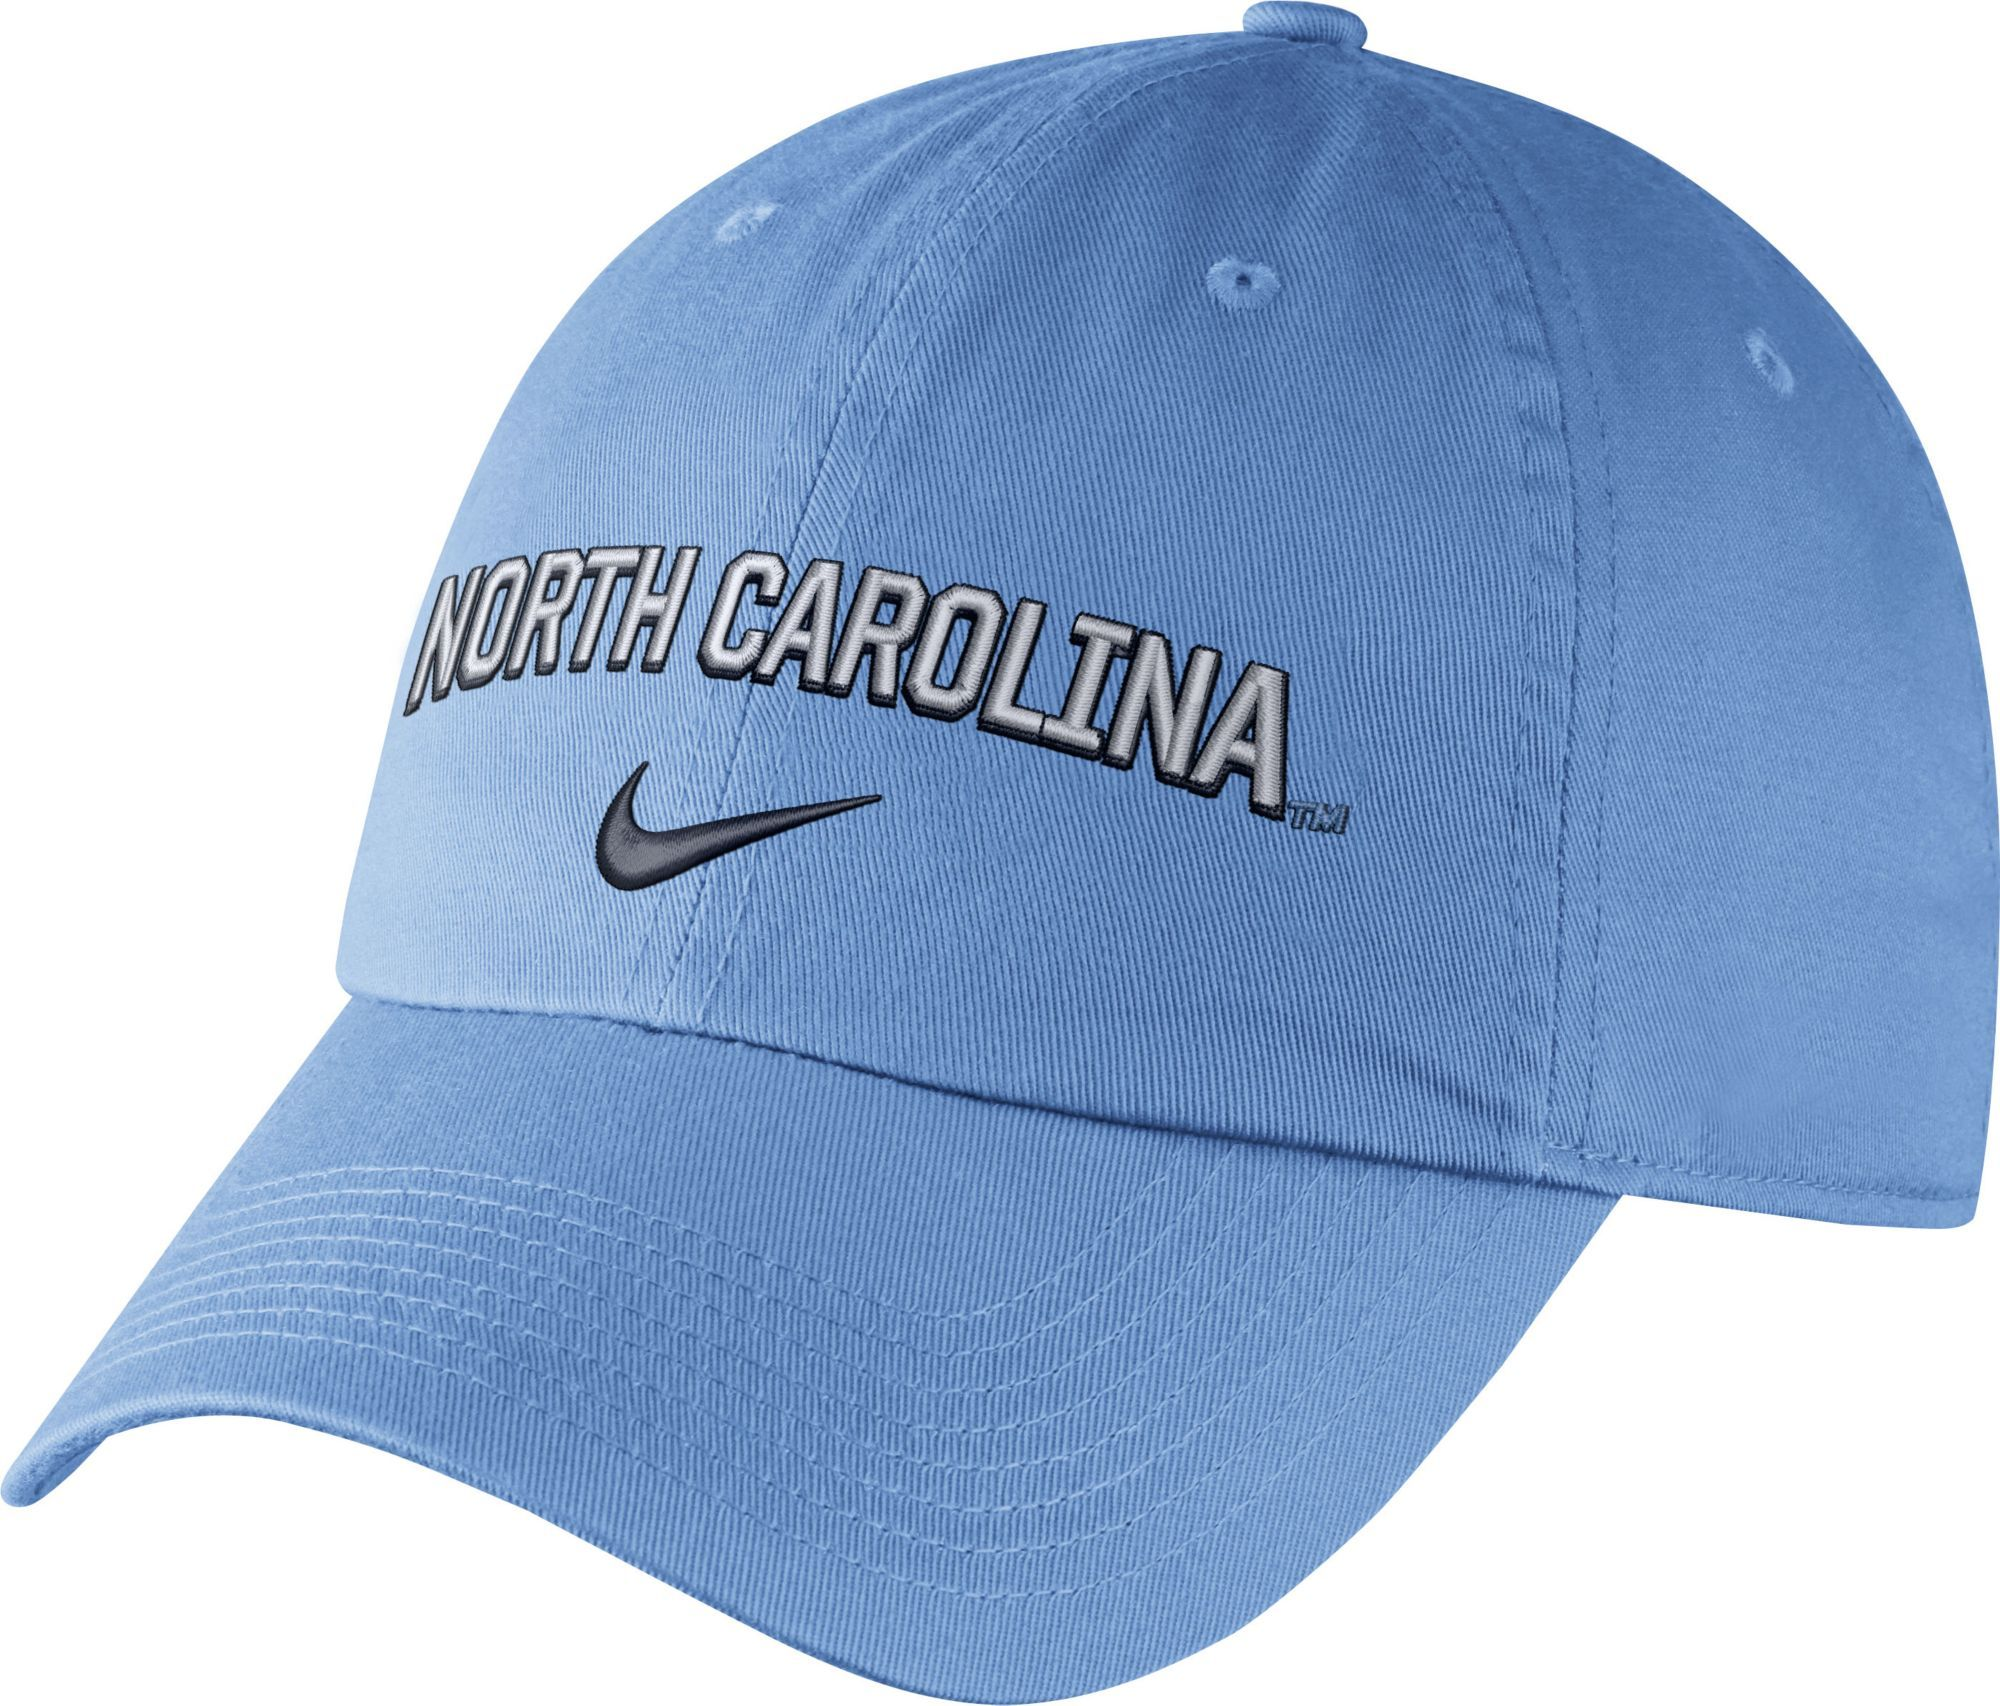 cheap for discount 85be6 74f38 Nike Men s North Carolina Tar Heels Carolina Blue Heritage86 Wordmark  Swoosh Flex Hat, Team